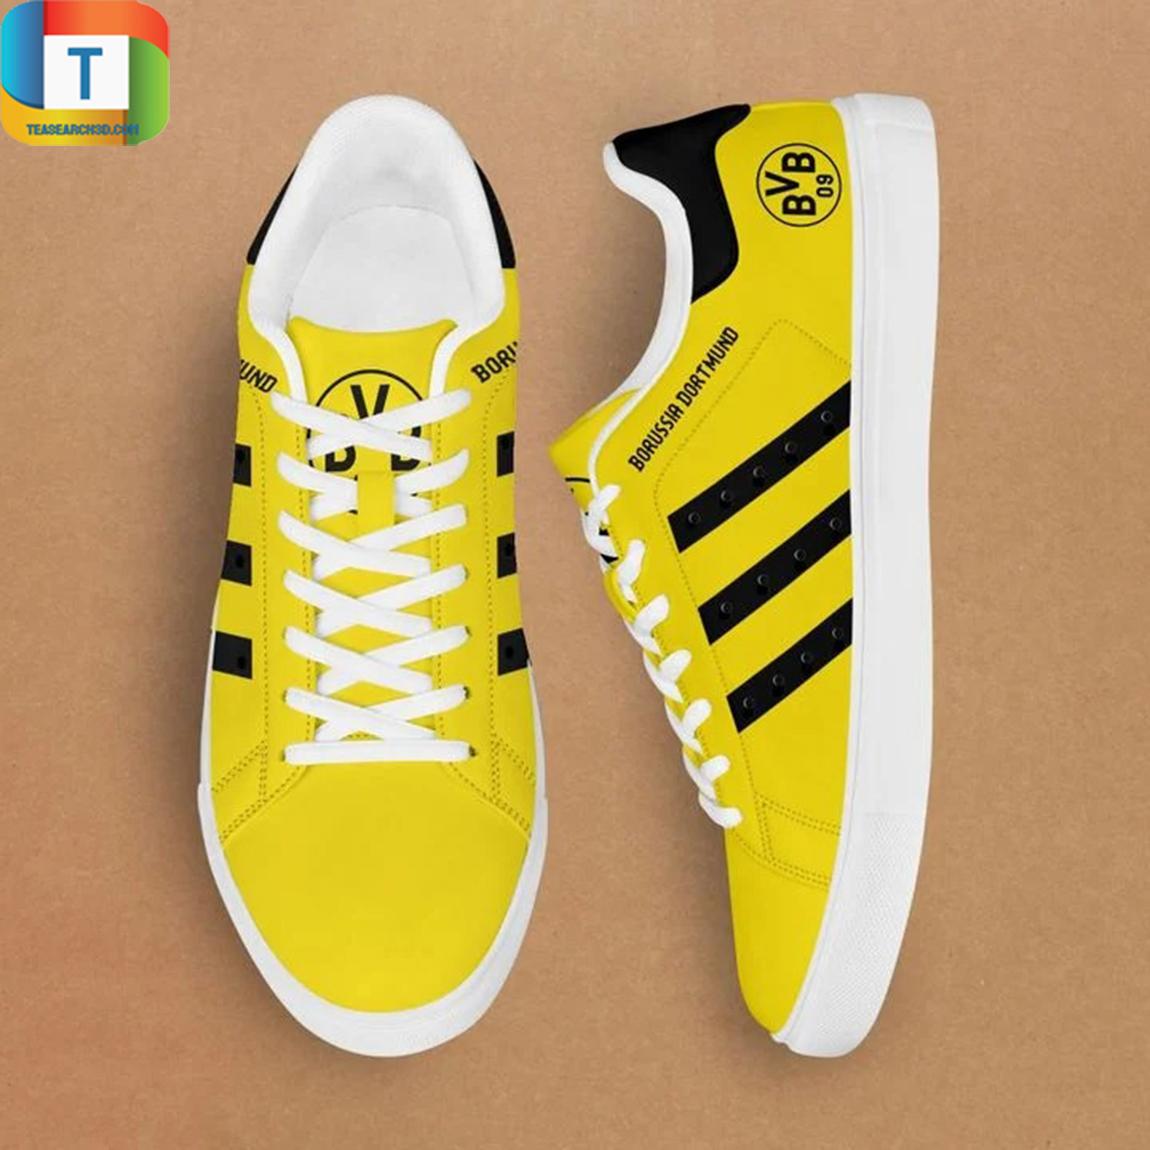 Dormund stan smith low top shoes 3